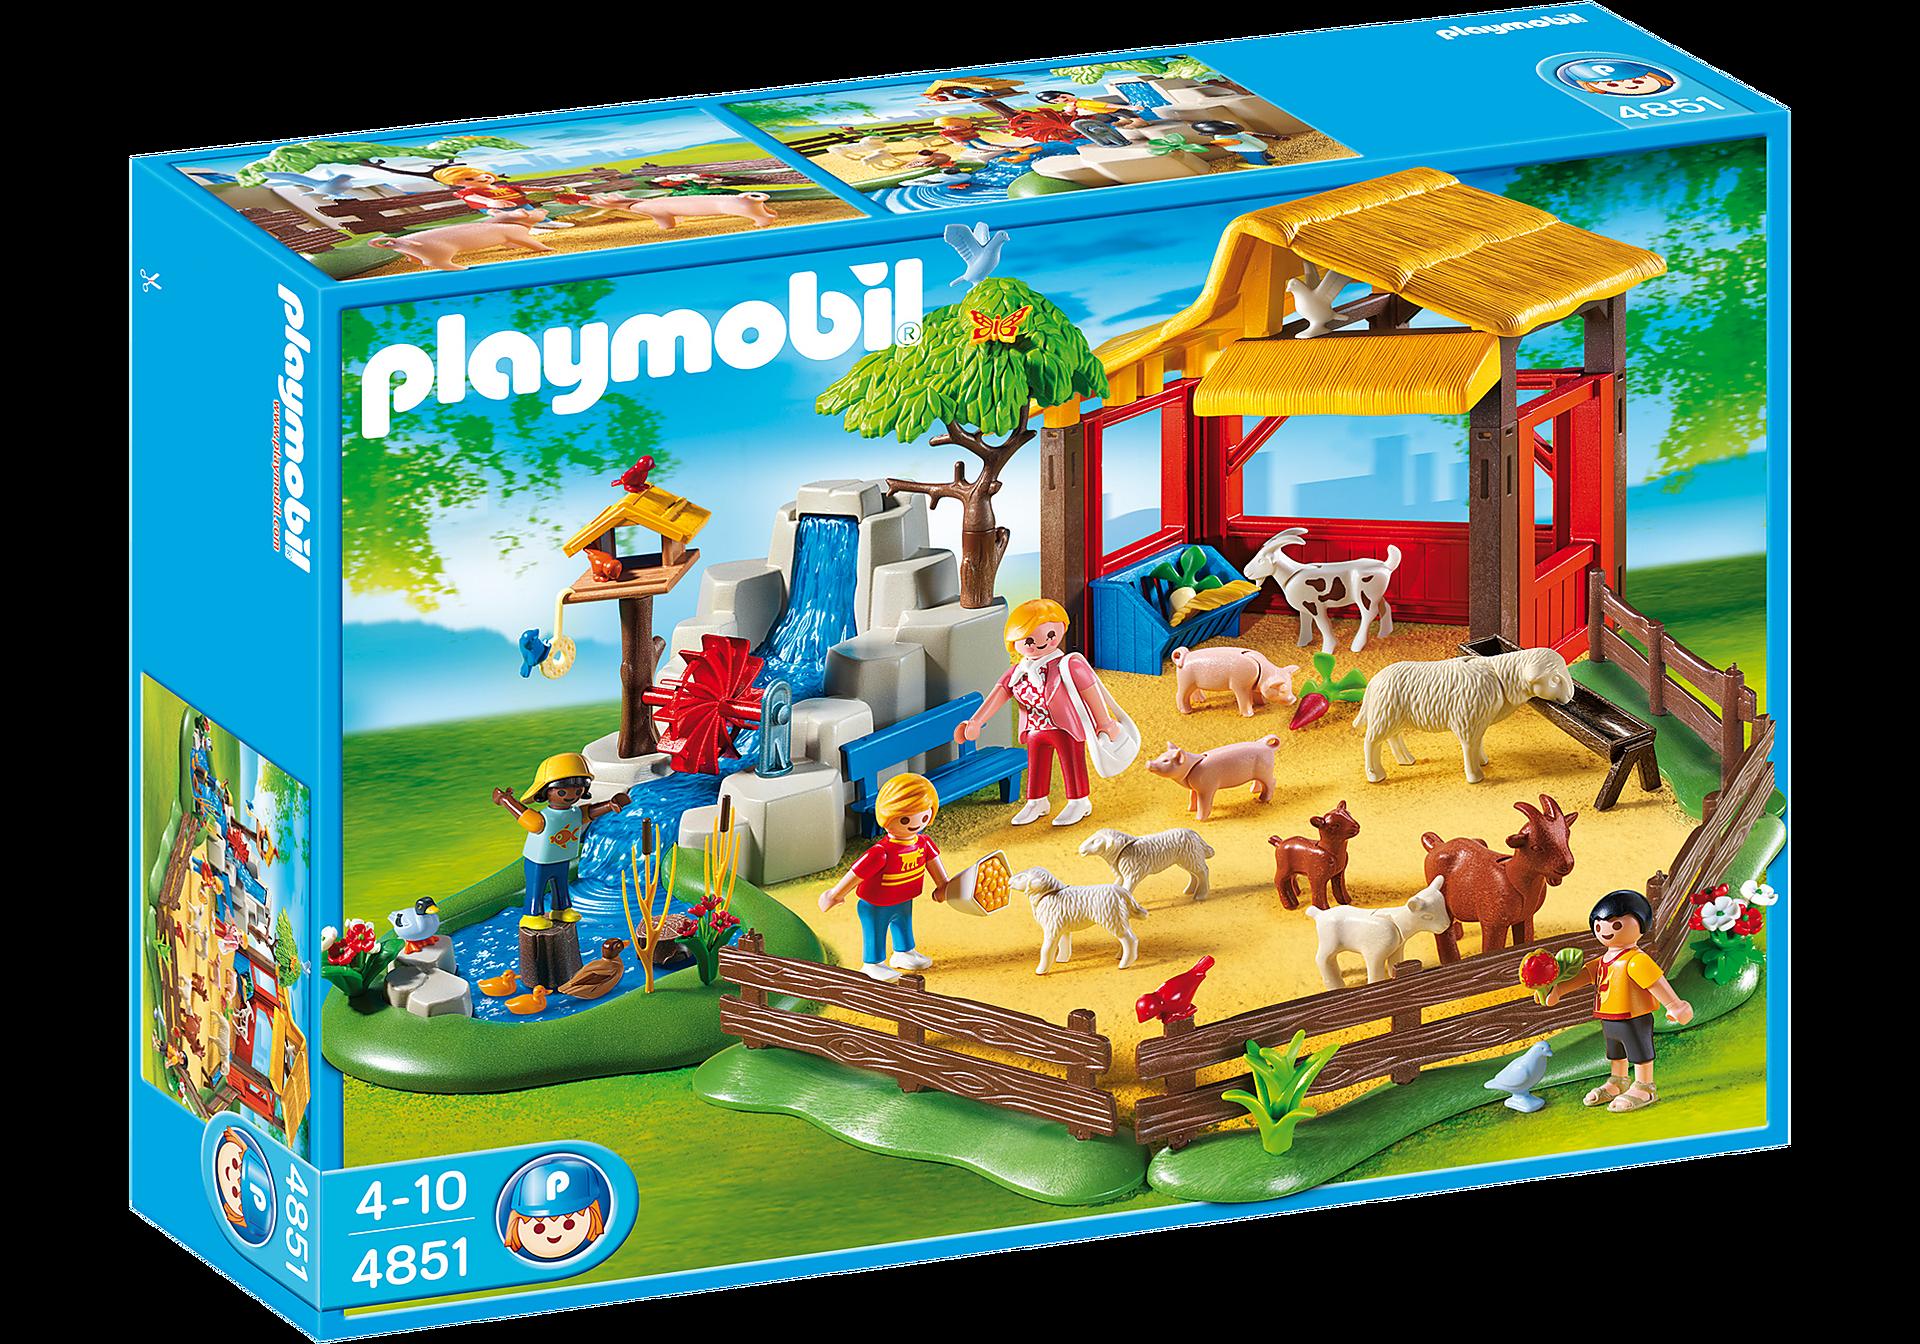 http://media.playmobil.com/i/playmobil/4851_product_box_front/Zoo per i bambini